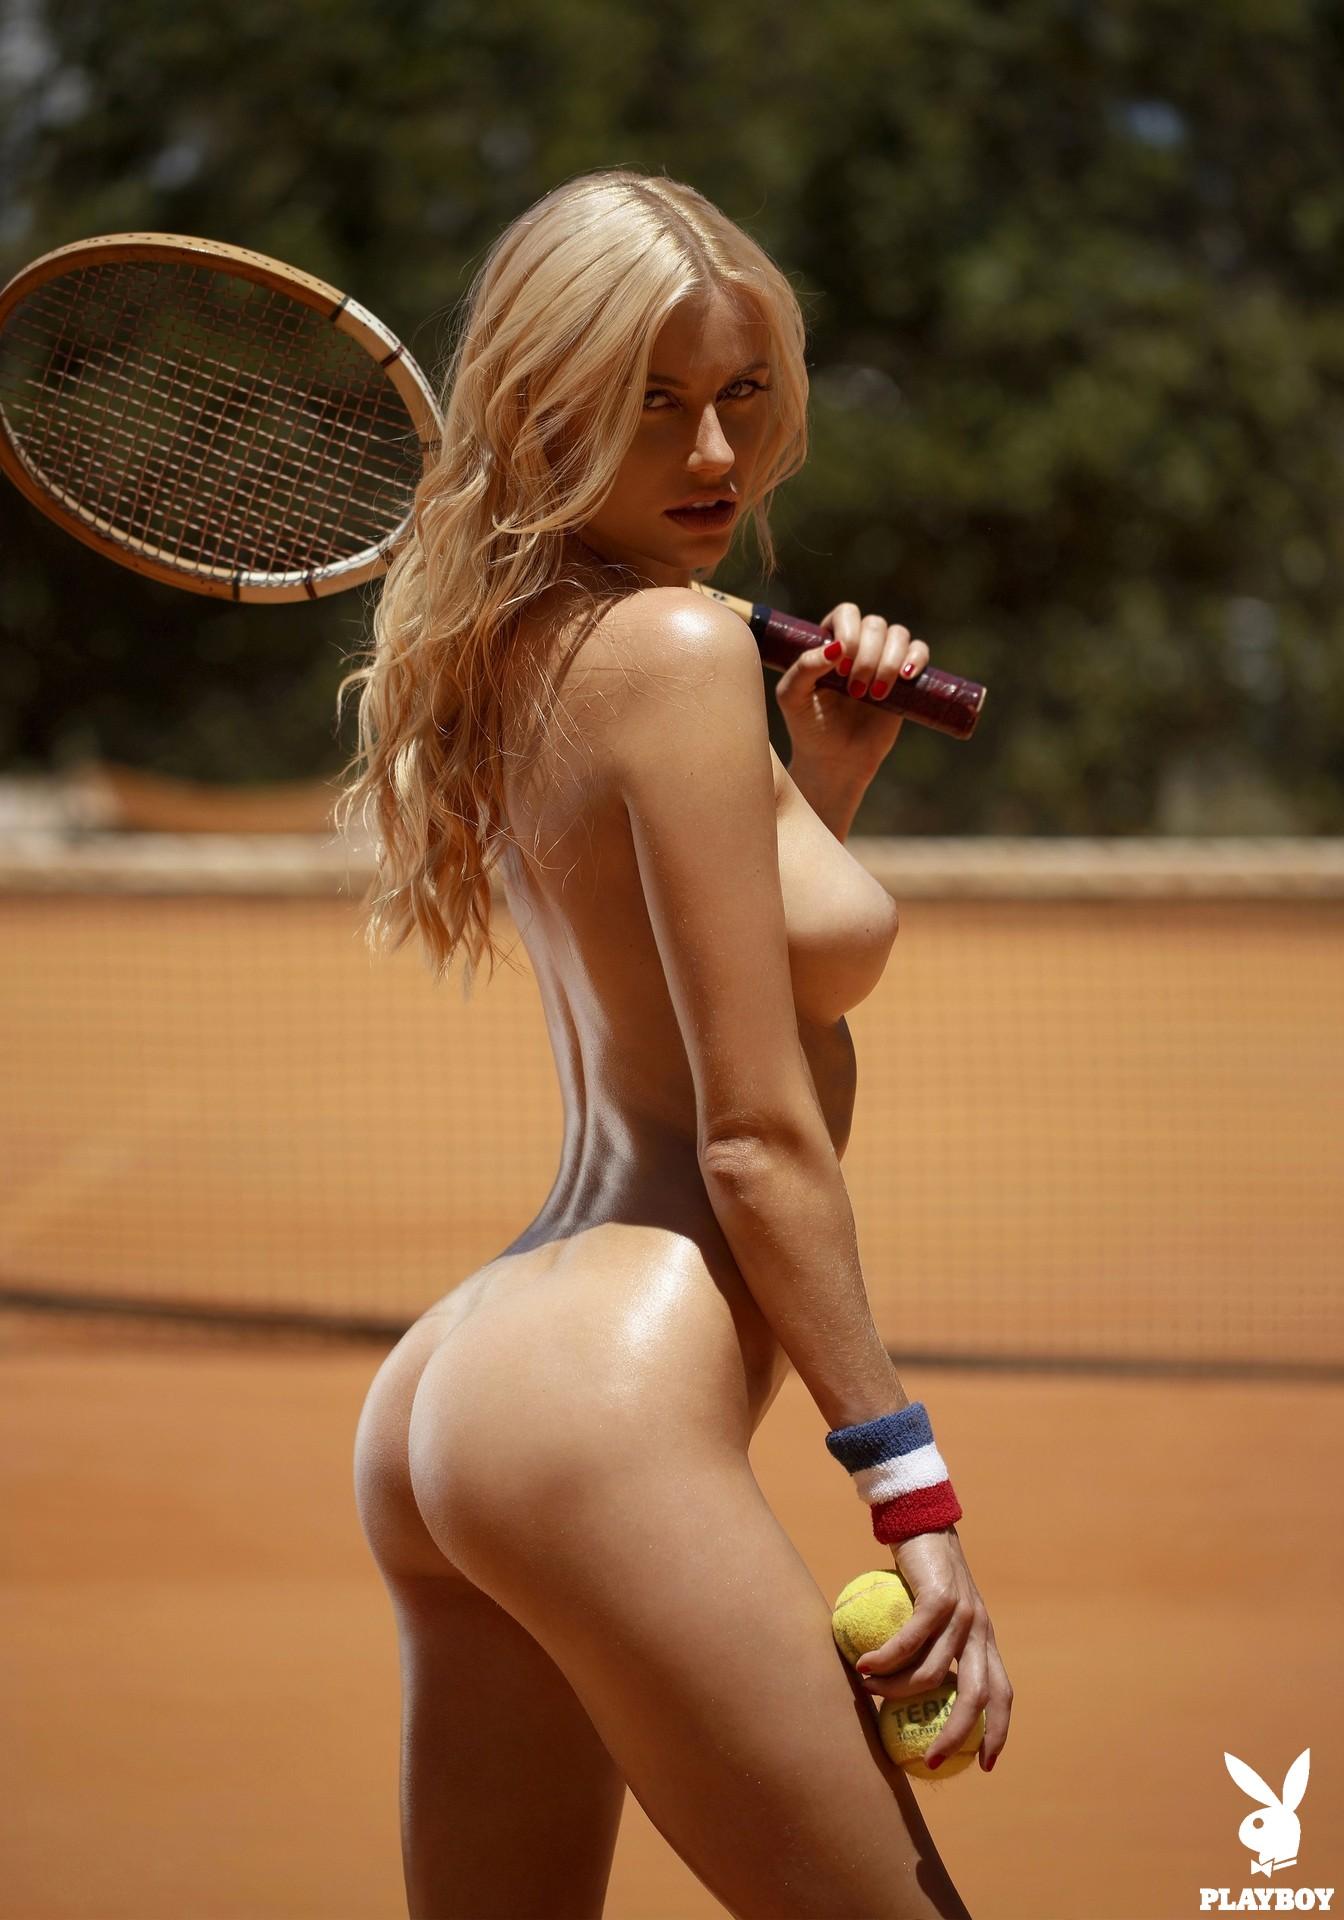 Naked tennis girl photo